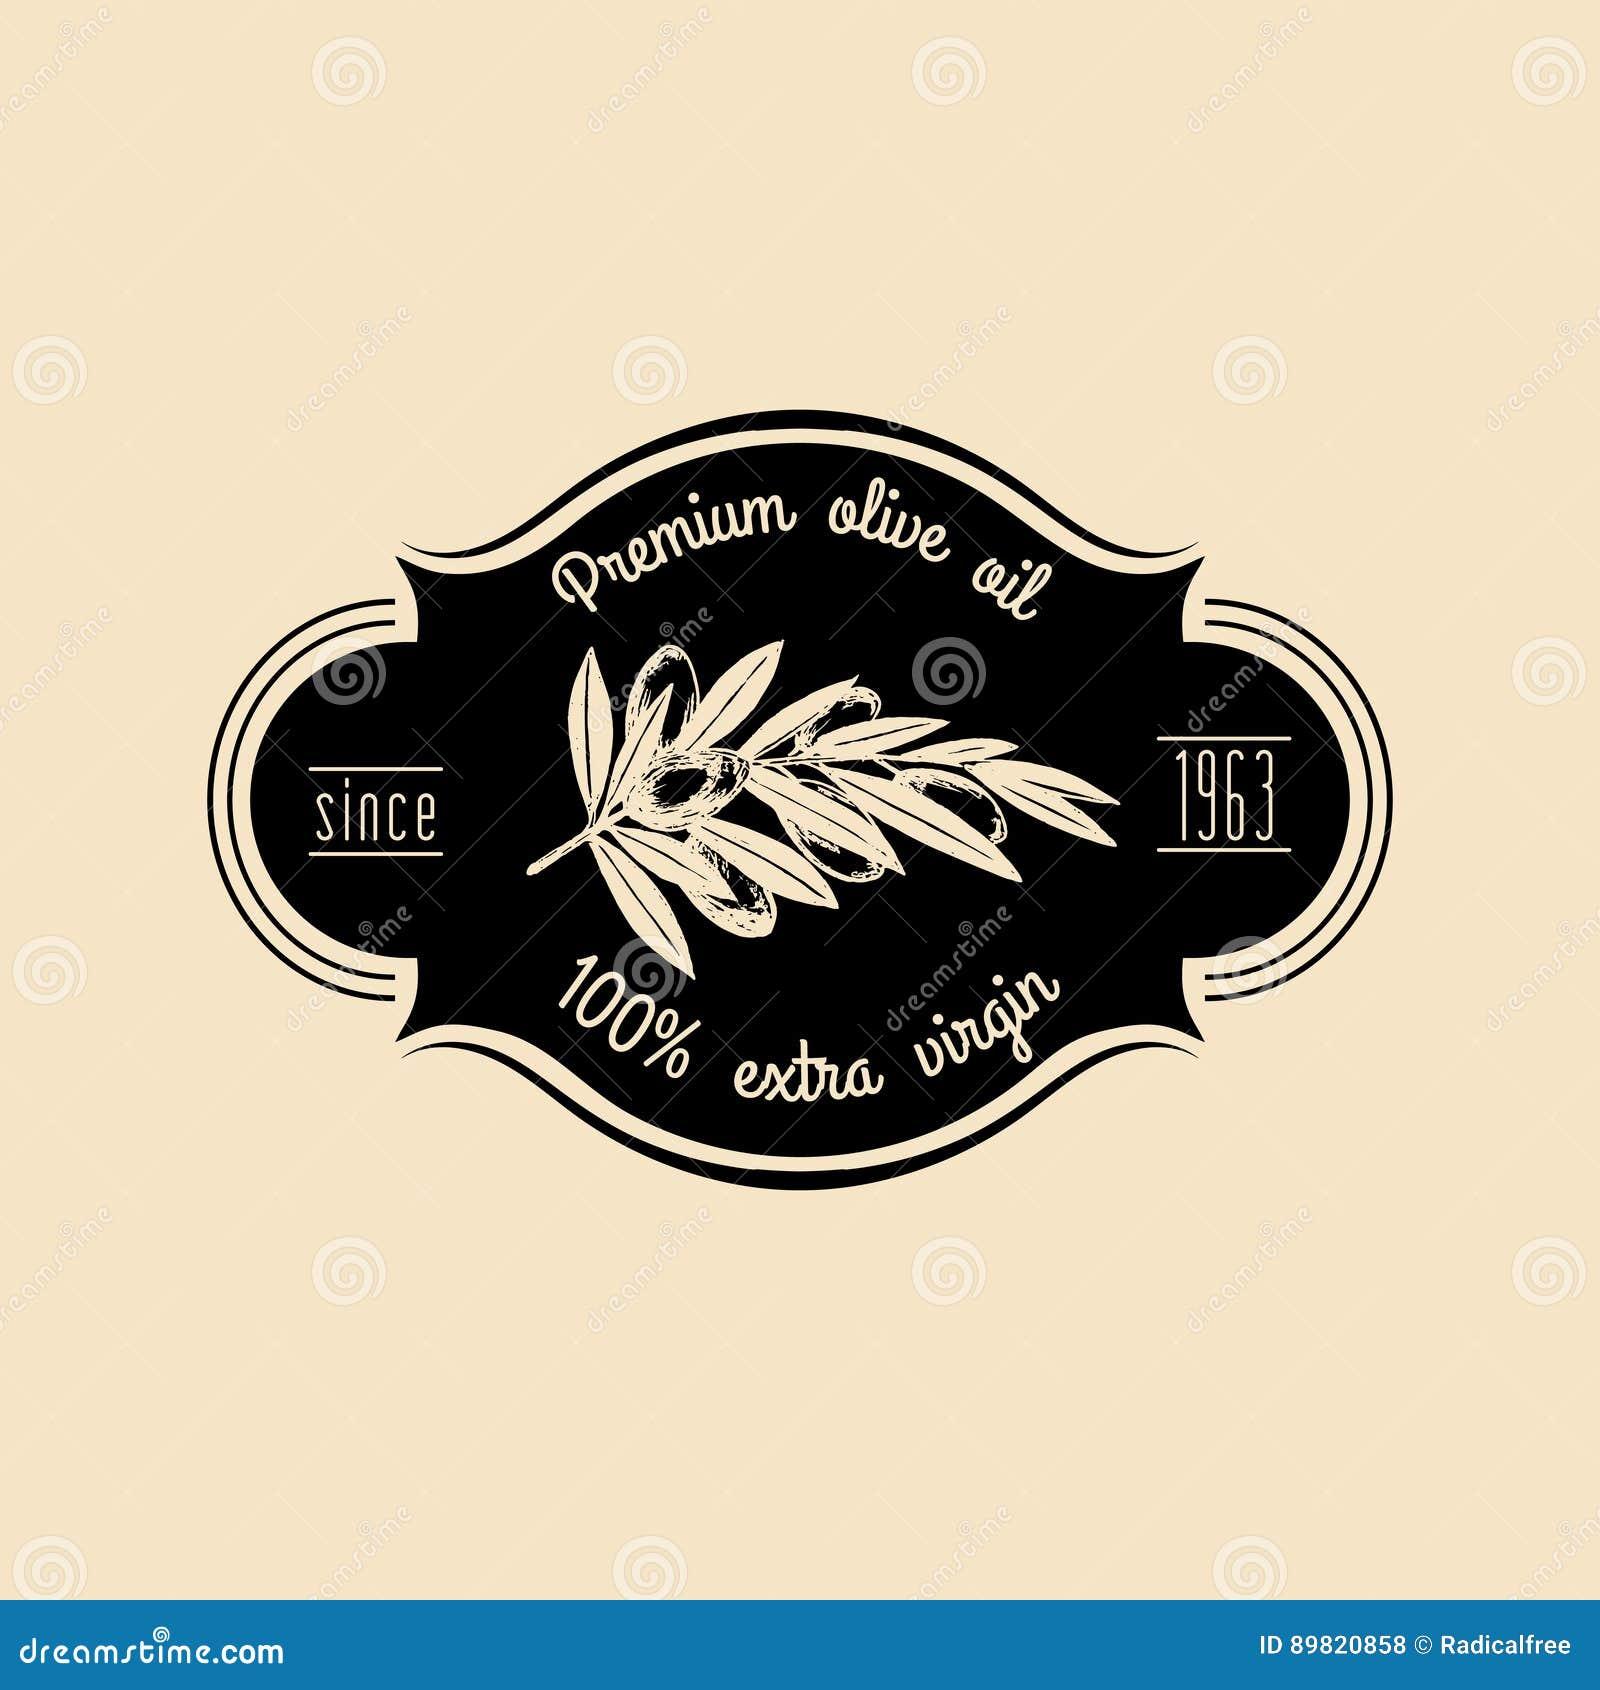 Vector vintage olive logo. Retro emblem with branch. Hand sketched natural extra virgin oil production sign.